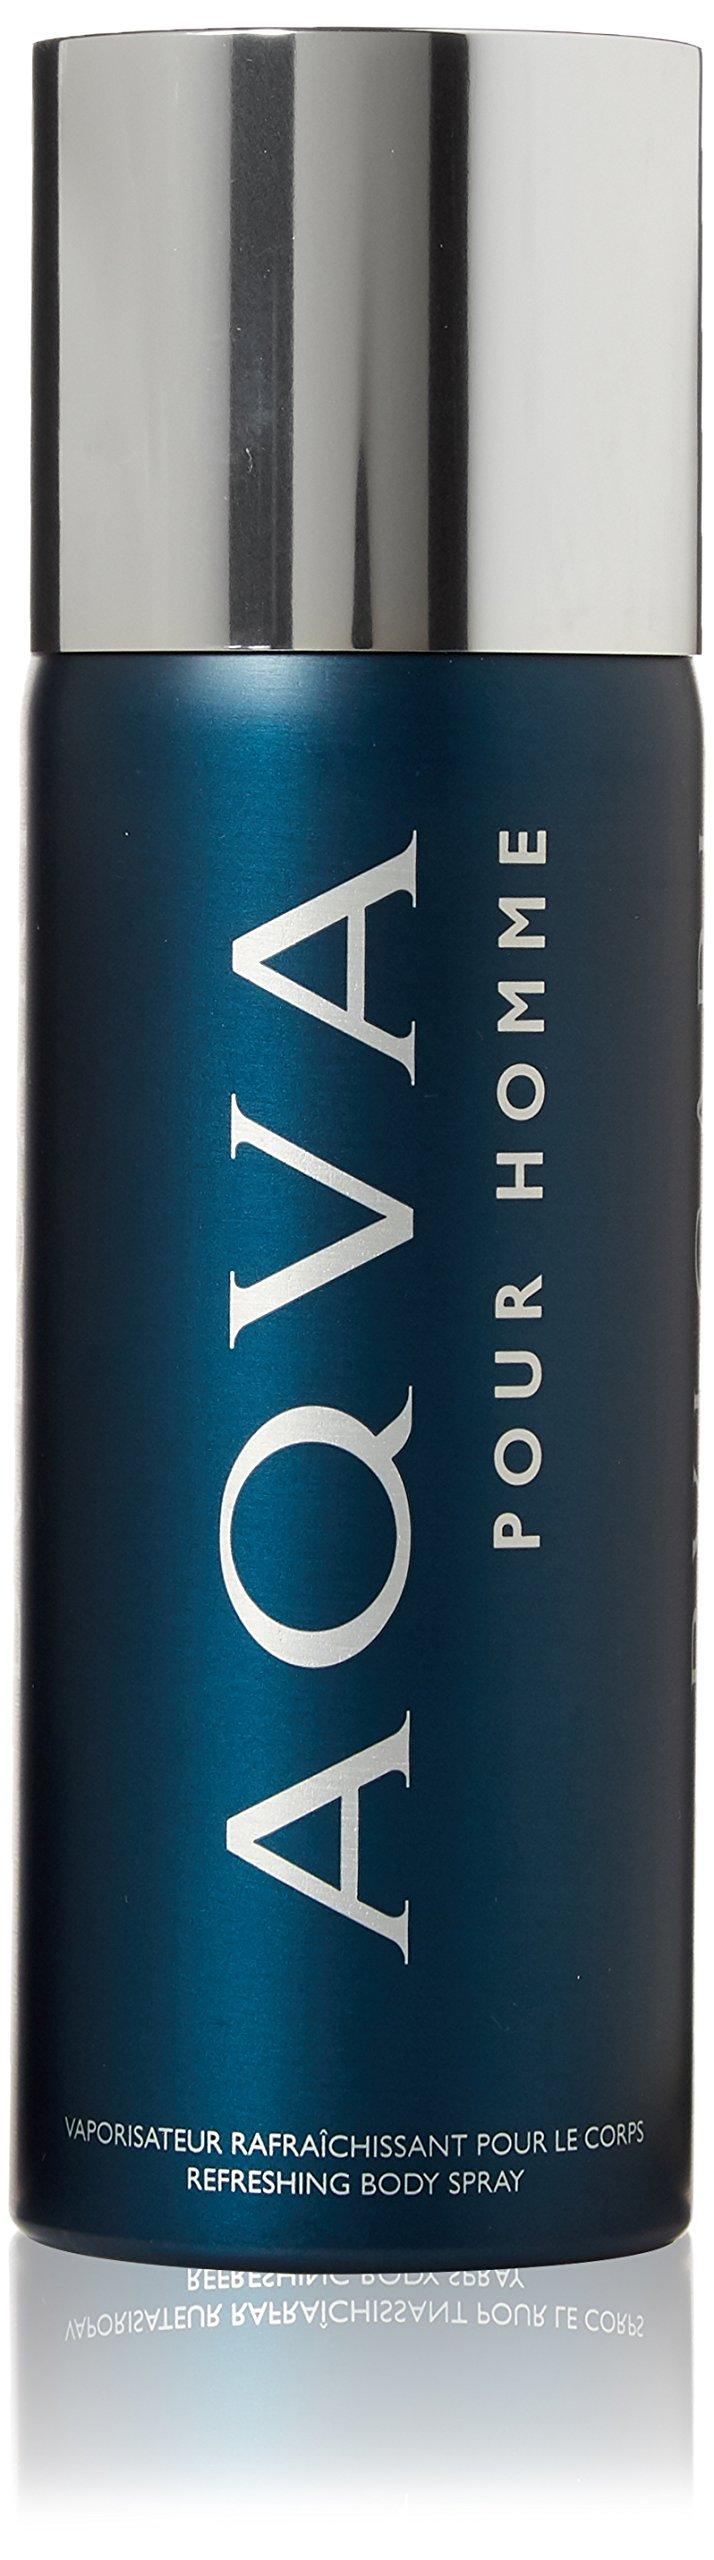 Bvlgari Refreshing Body Spray for Men, Aqva, 5.07 Ounce